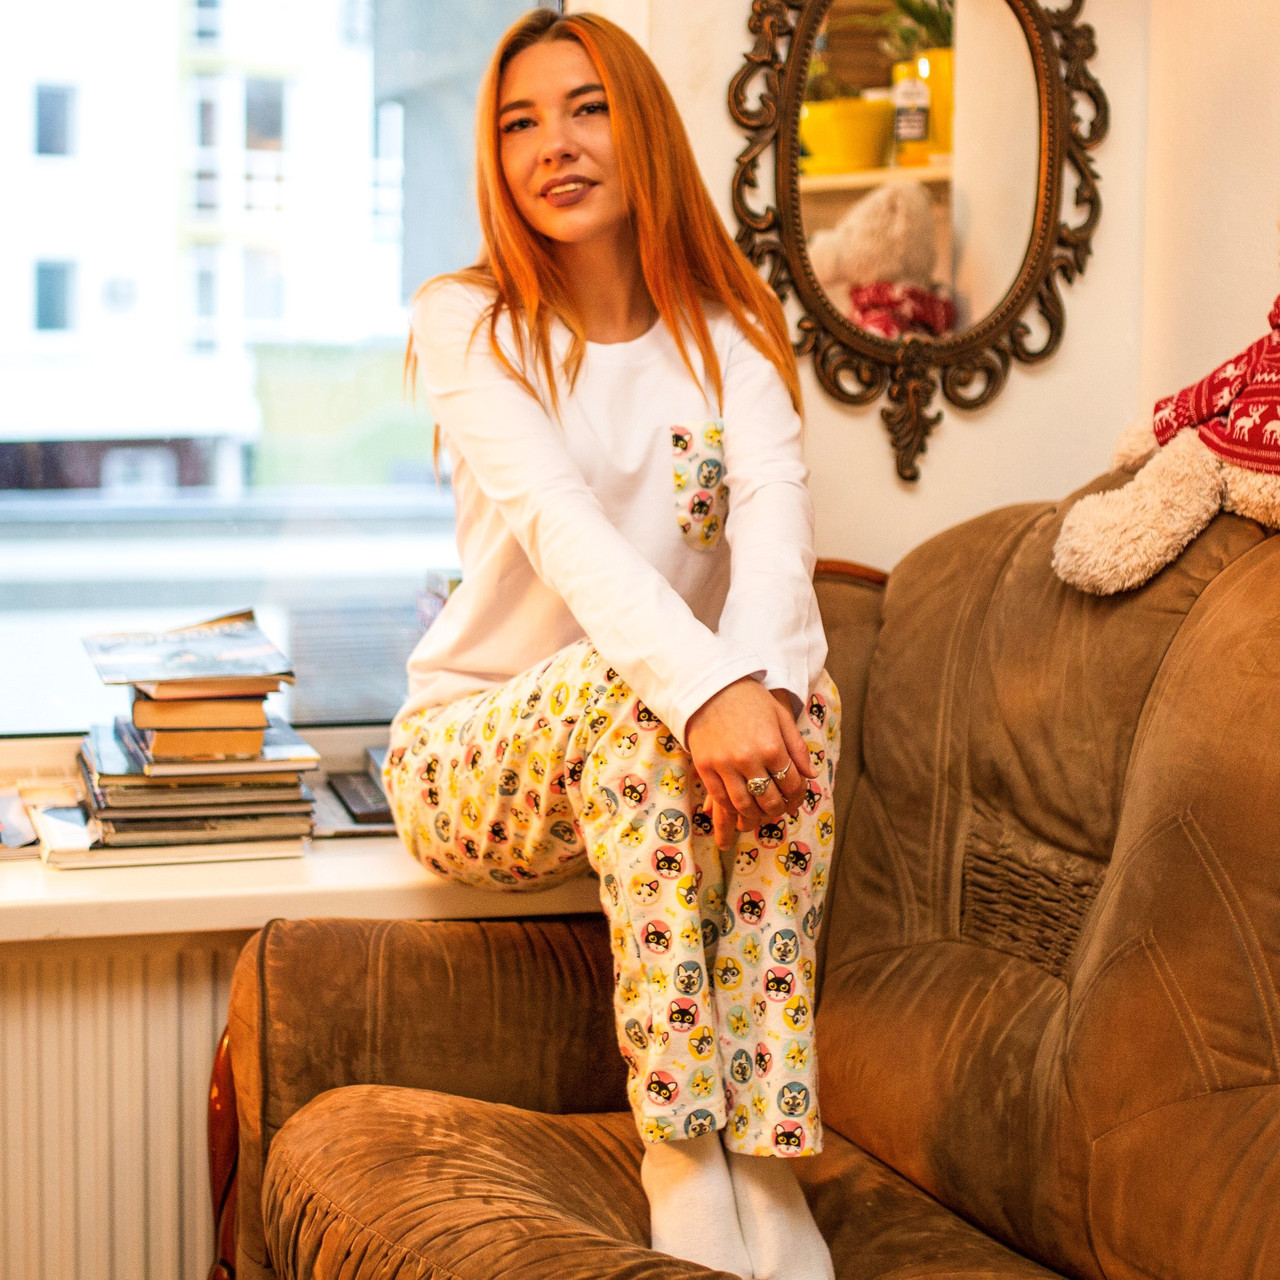 Фланелевая пижама с кофтой Котики XXXL